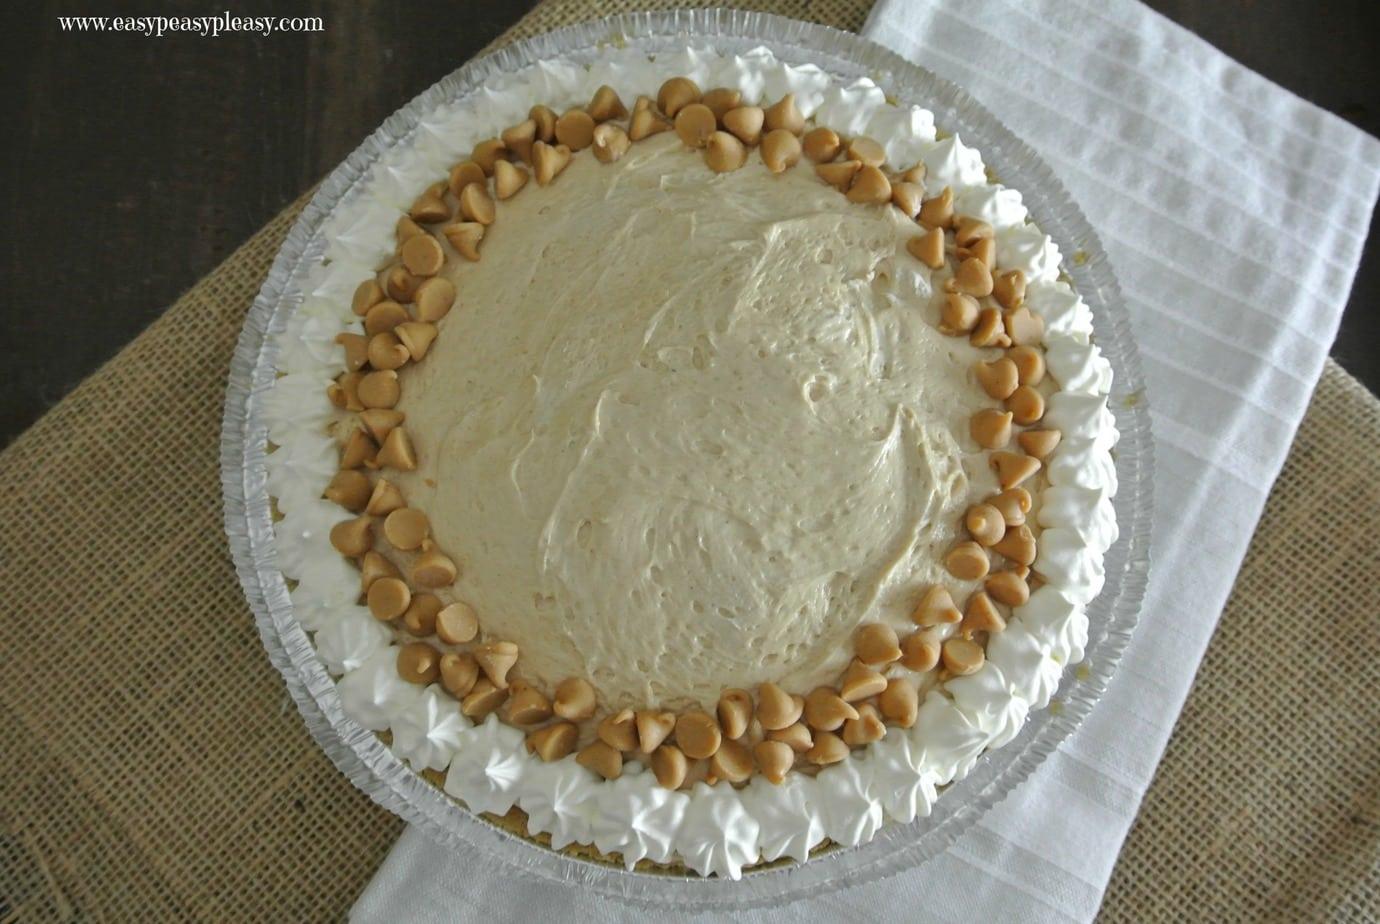 Easy No Bake Make Ahead Peanut Butter Pie